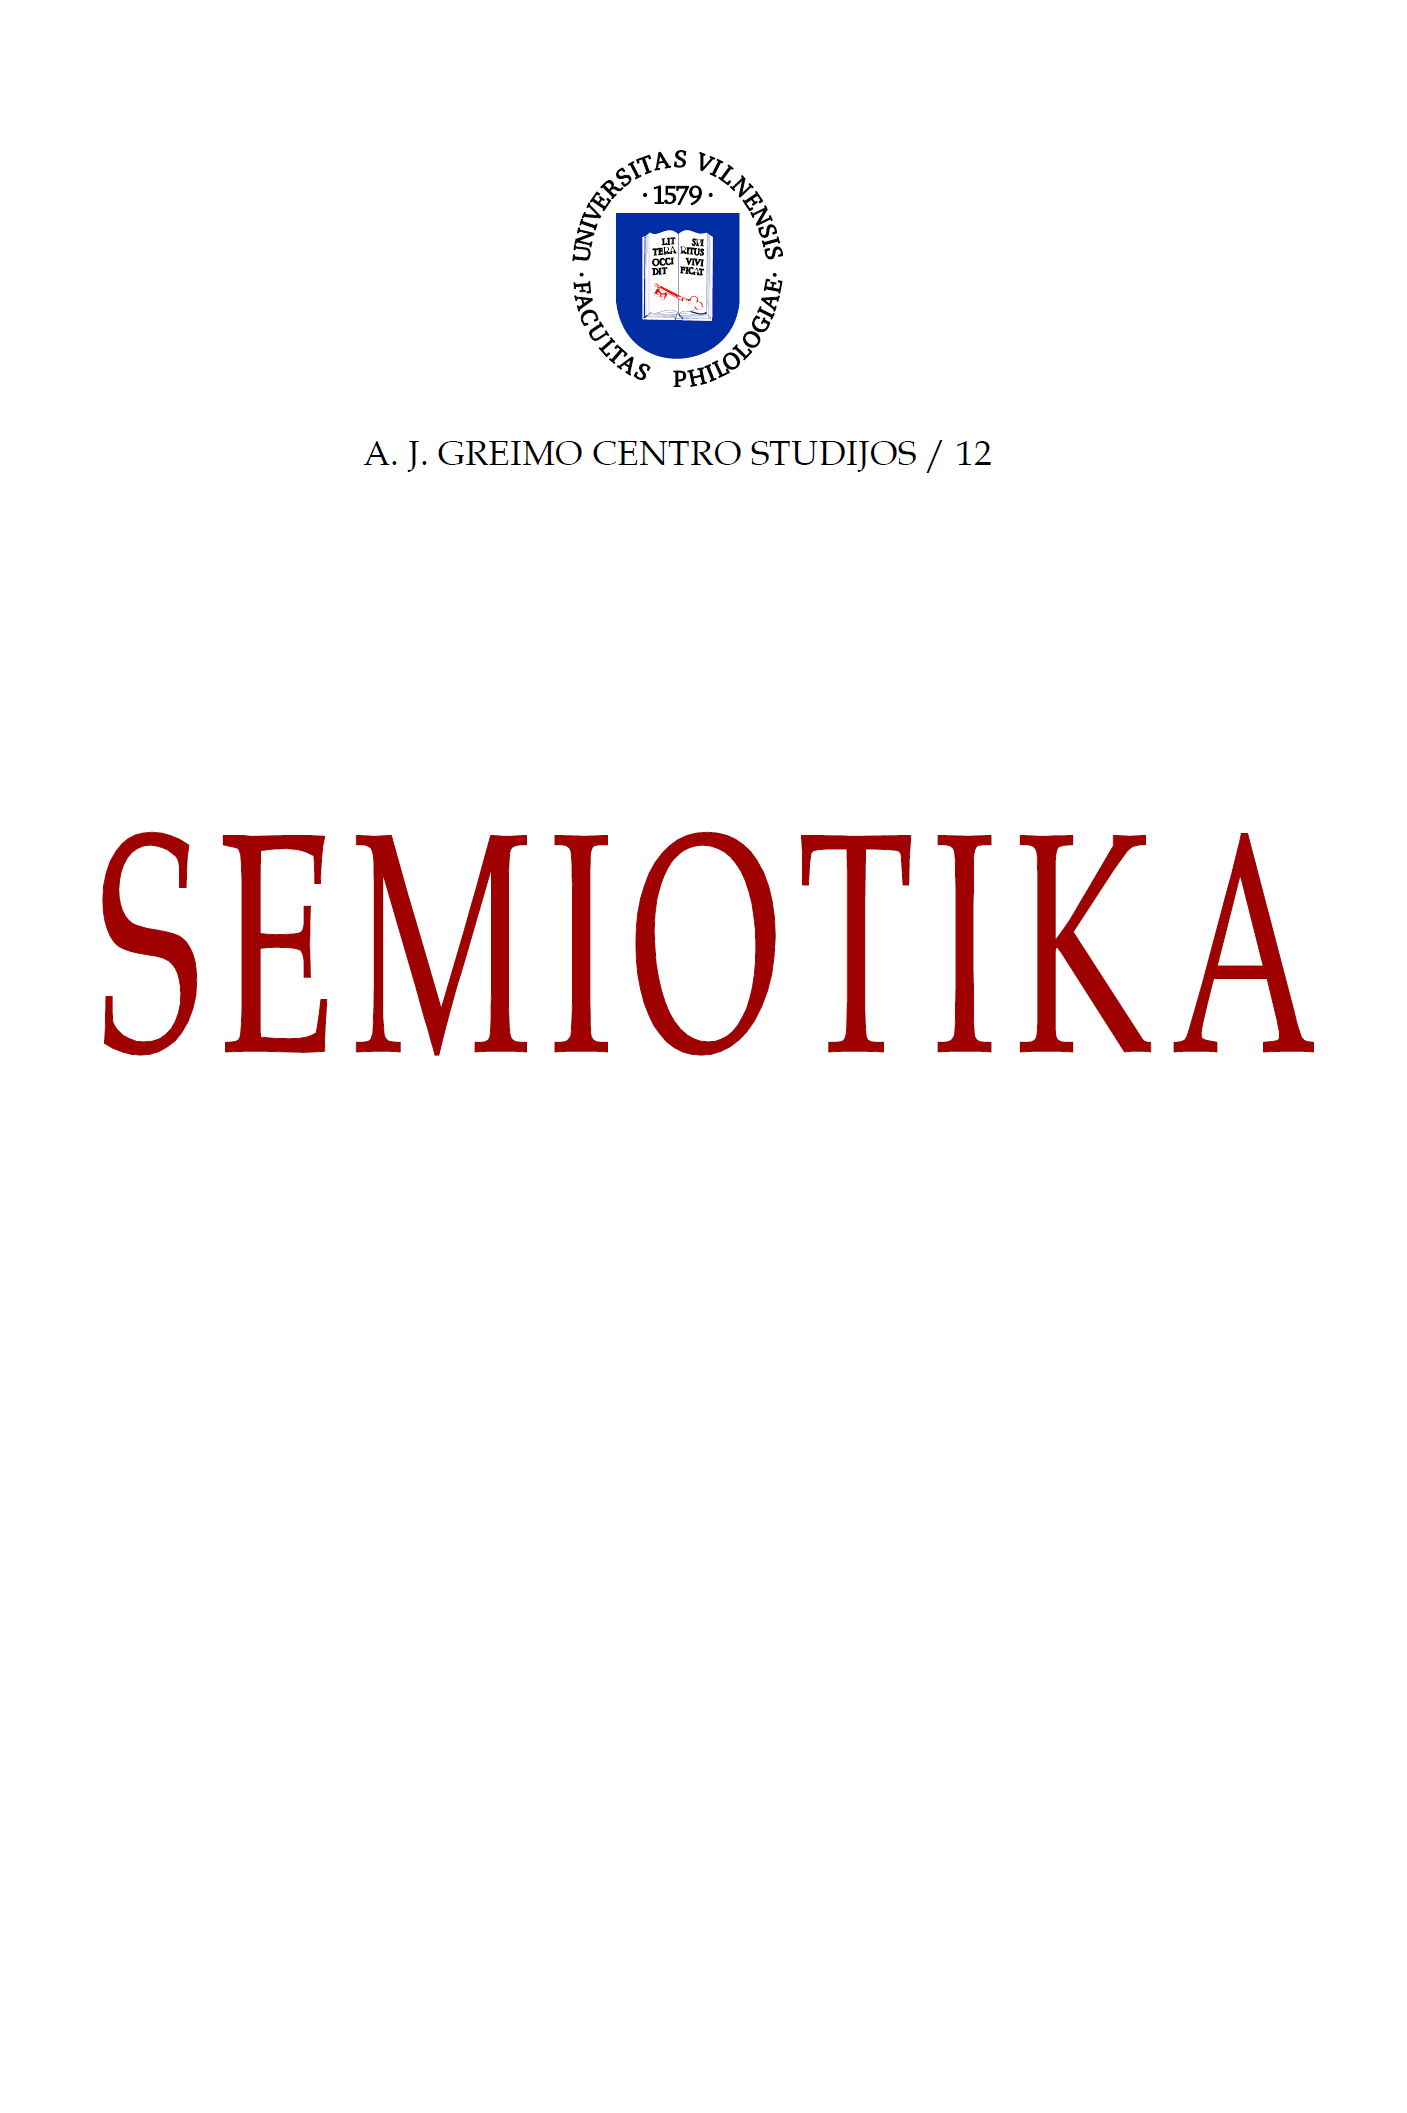 Semiotika cover 11